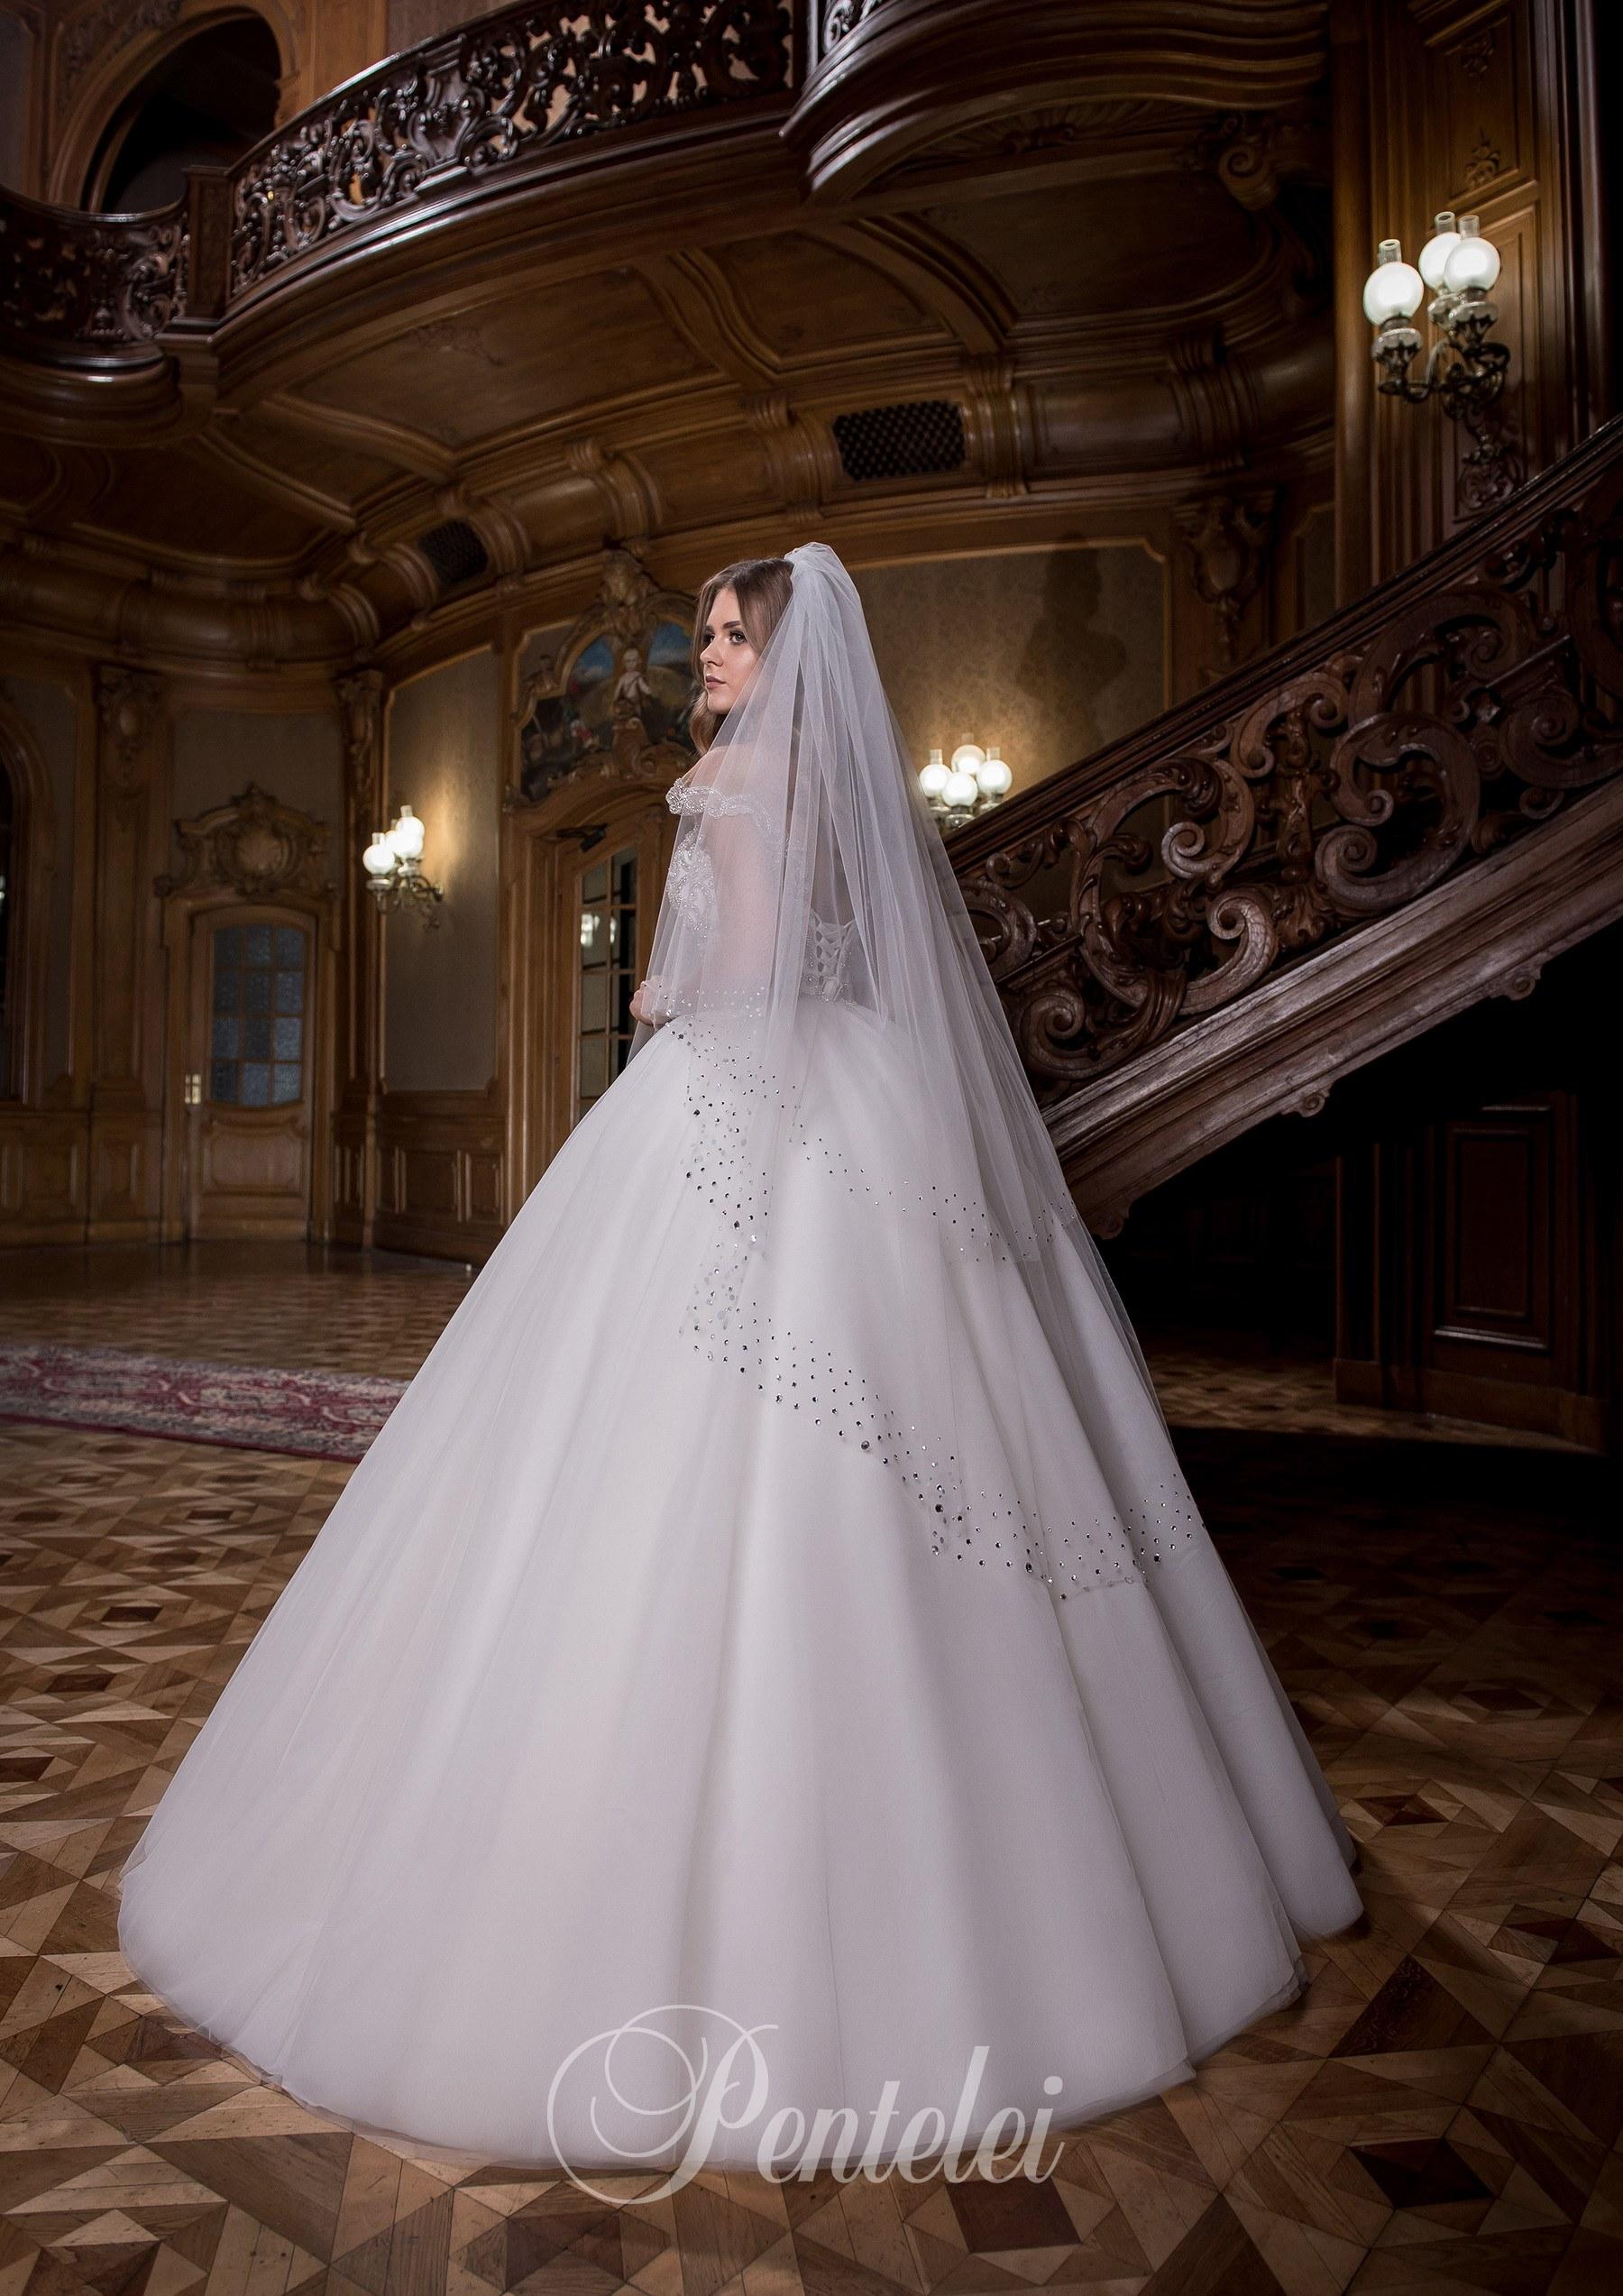 1712 | Buy wedding dresses wholesale from Pentelei